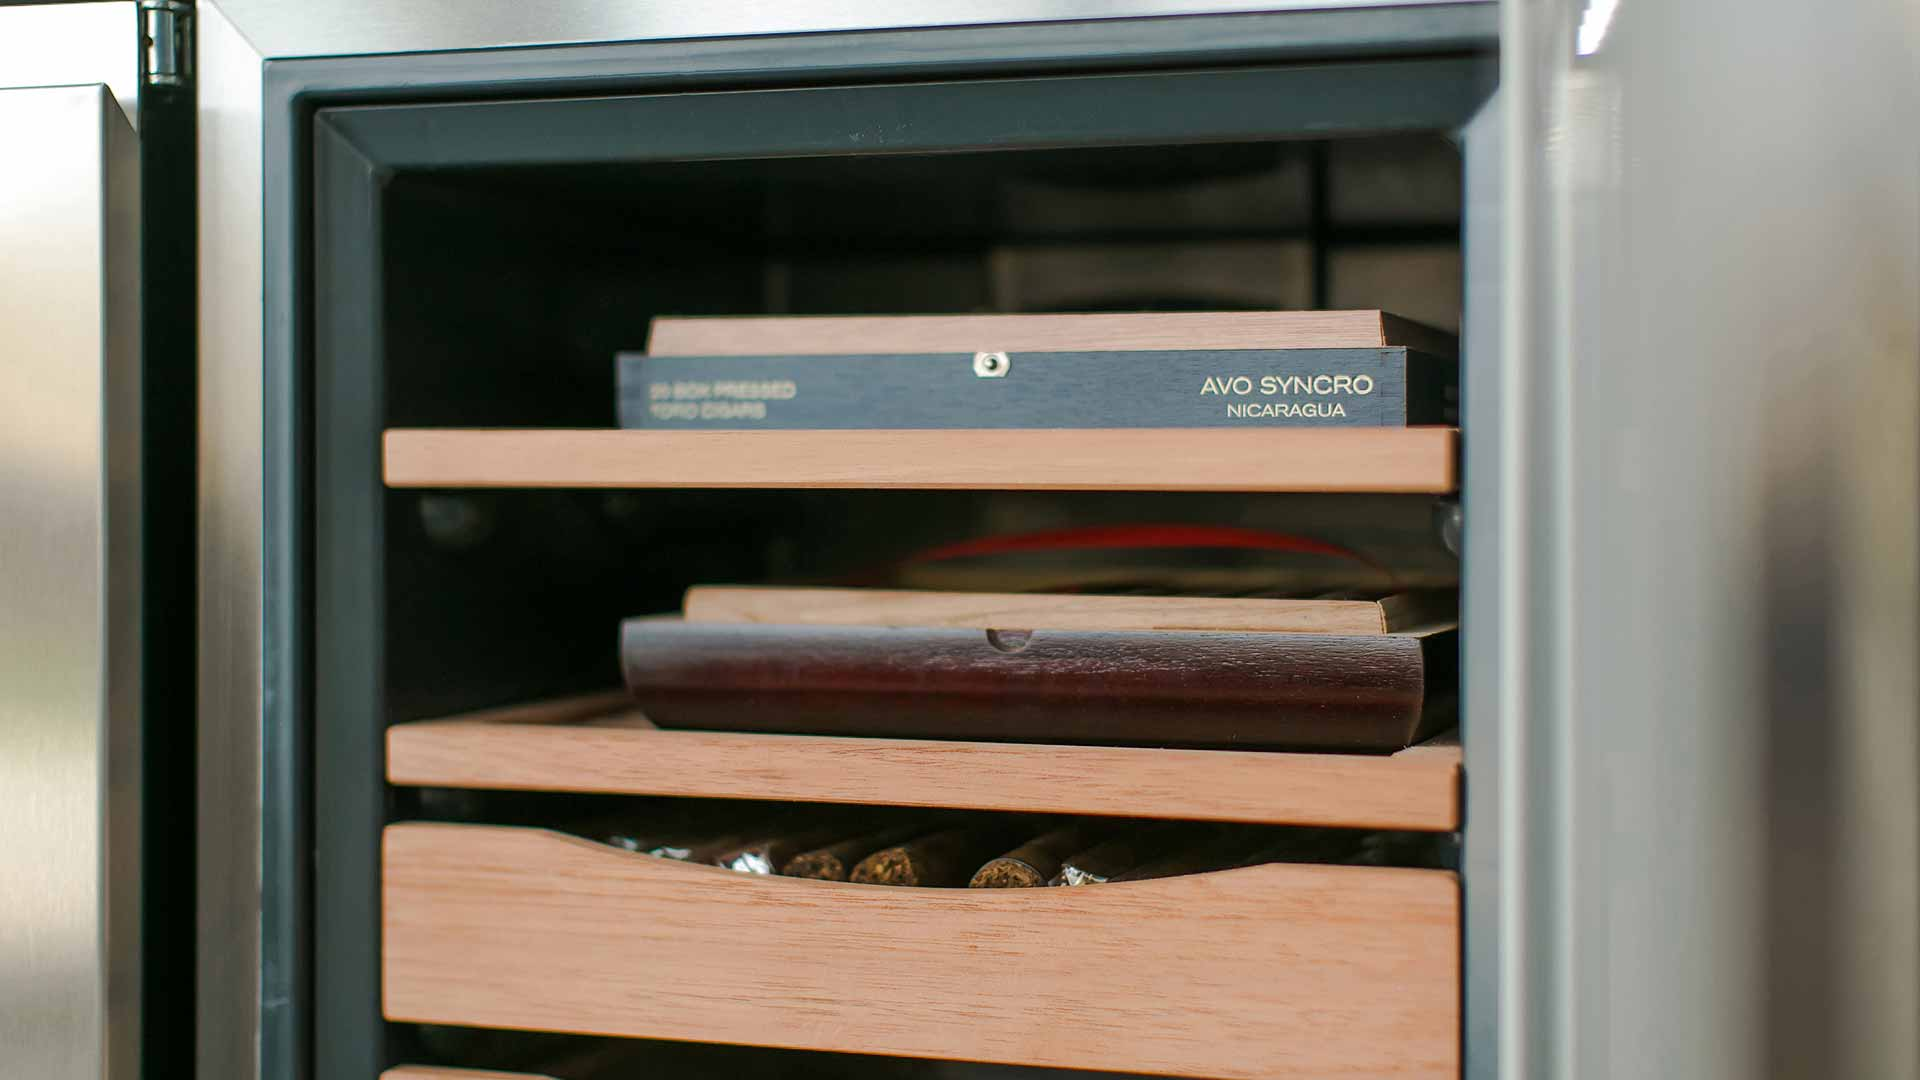 Cigar Room Addition - Humidor - Midcentury Modern Addition - Brendonwood, Indianapolis